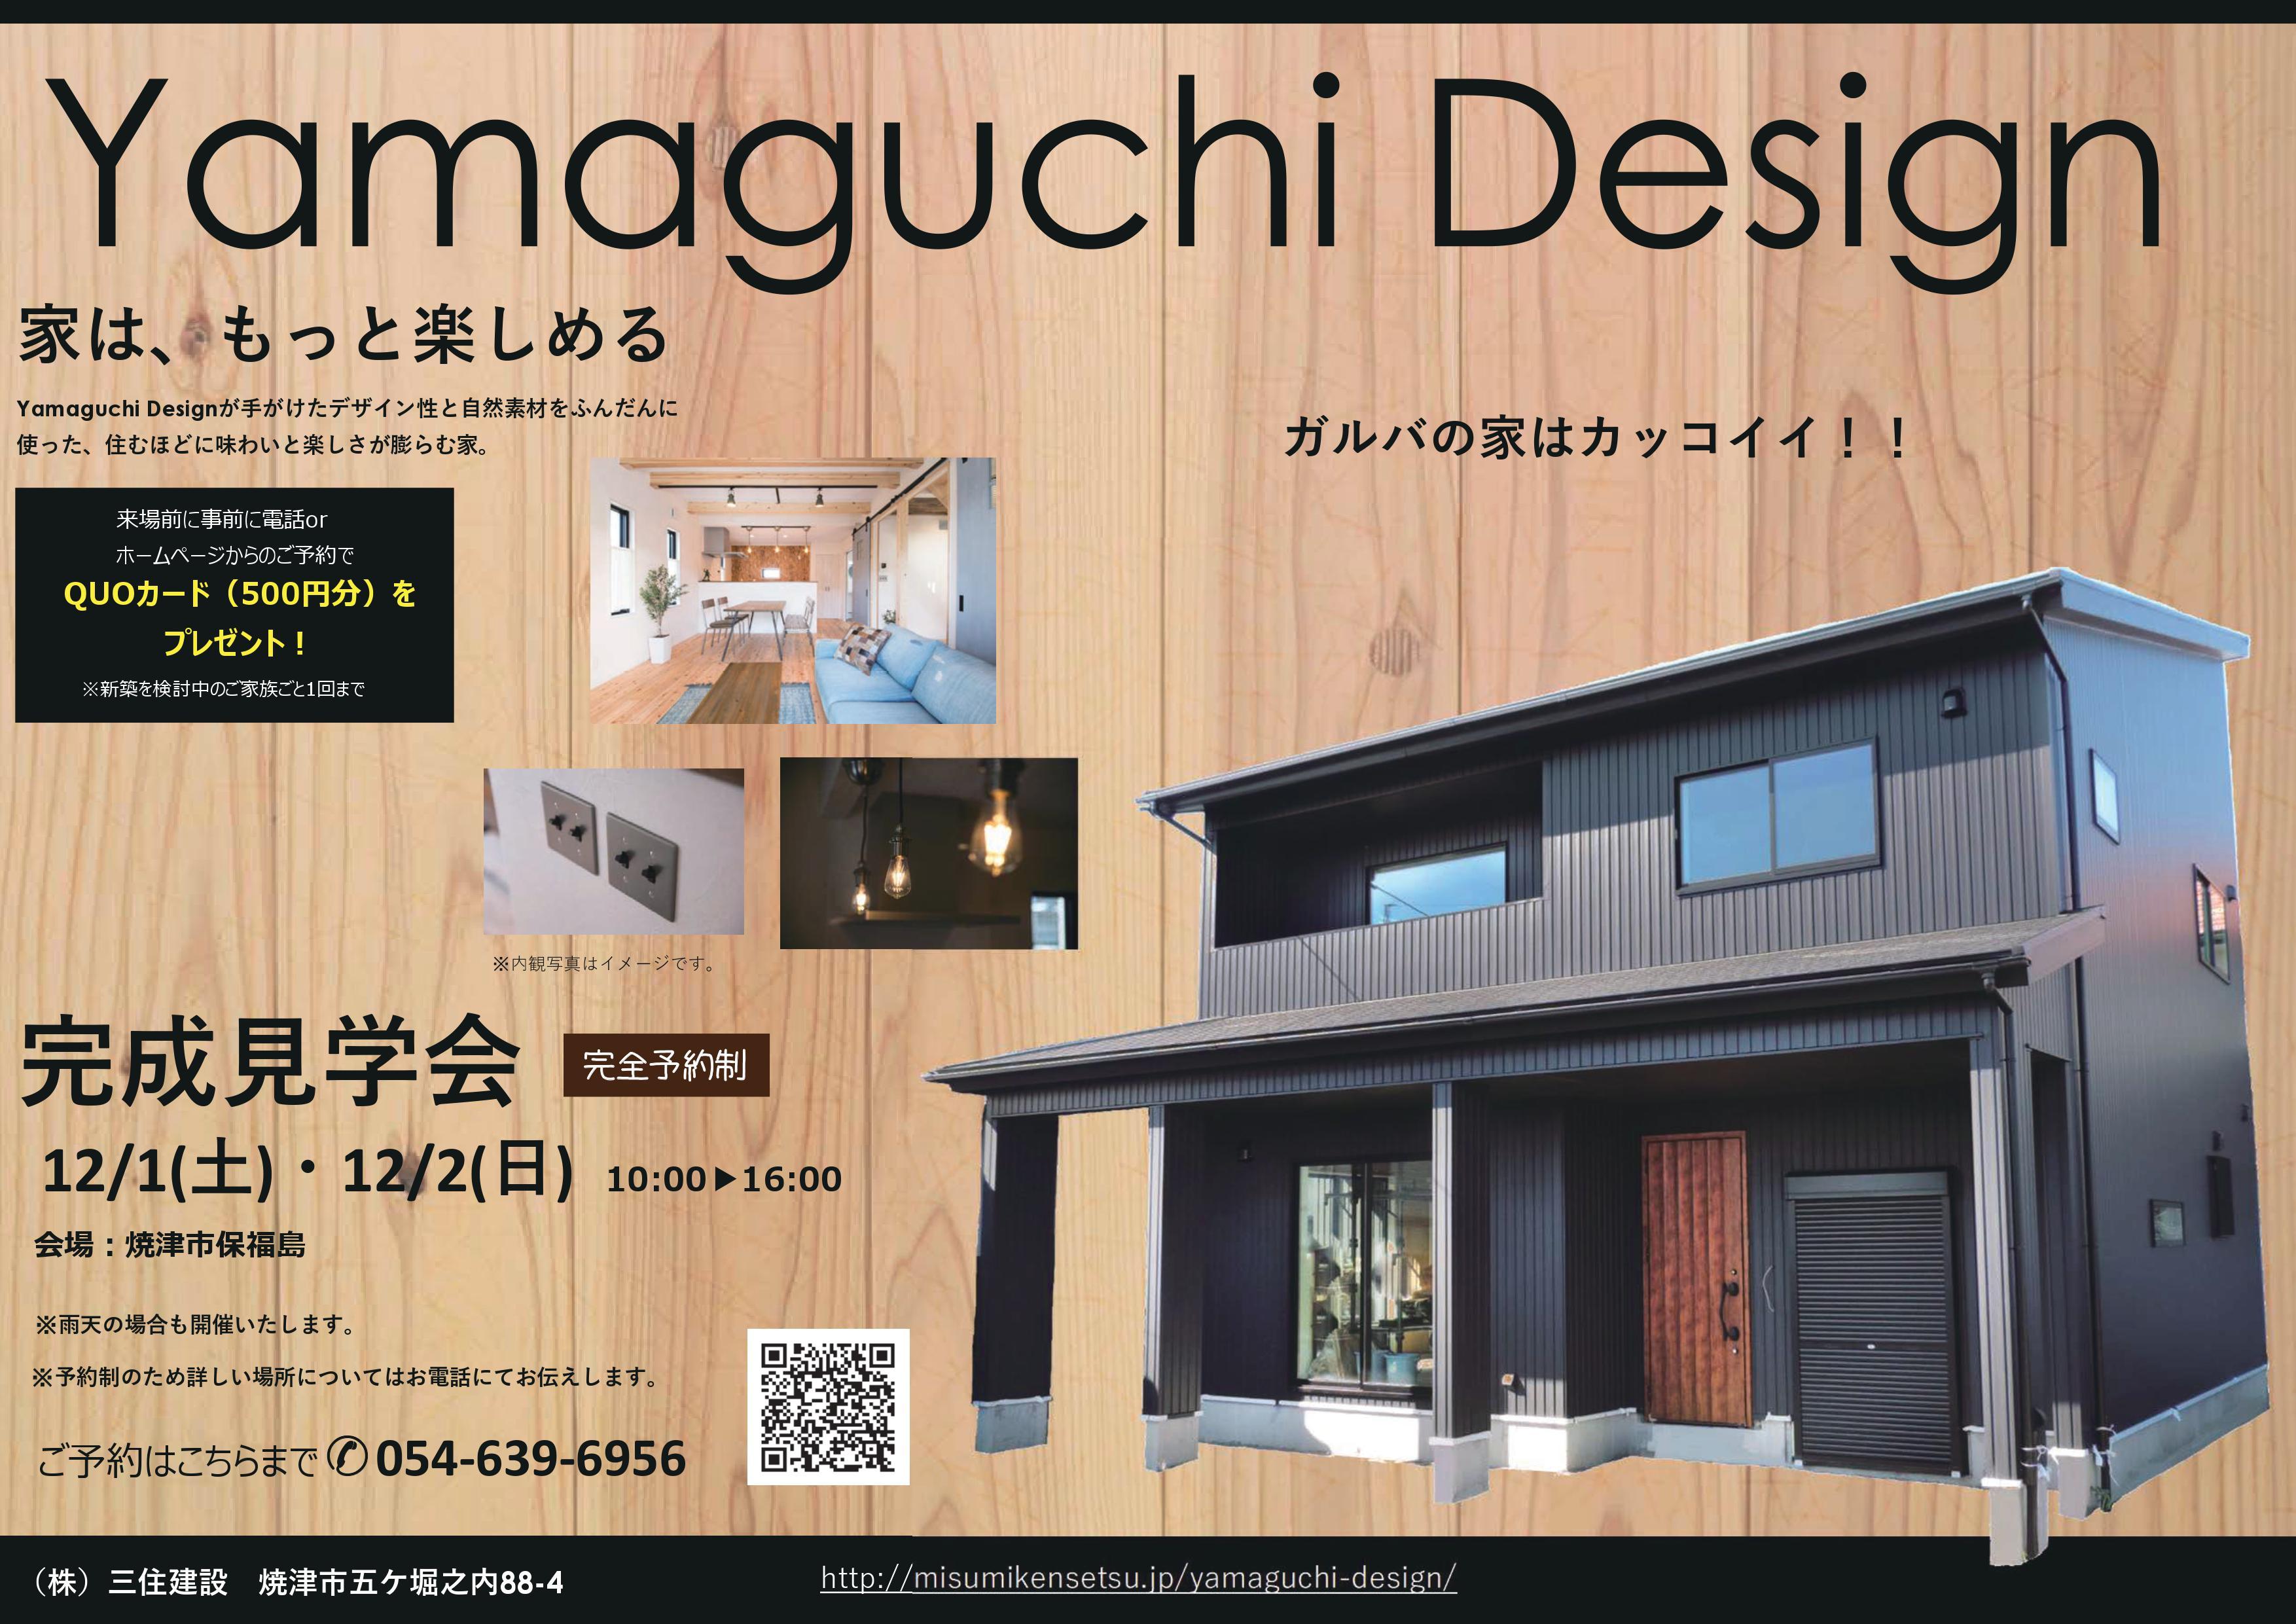 予約制現場見学会(YamaguchiDesign)